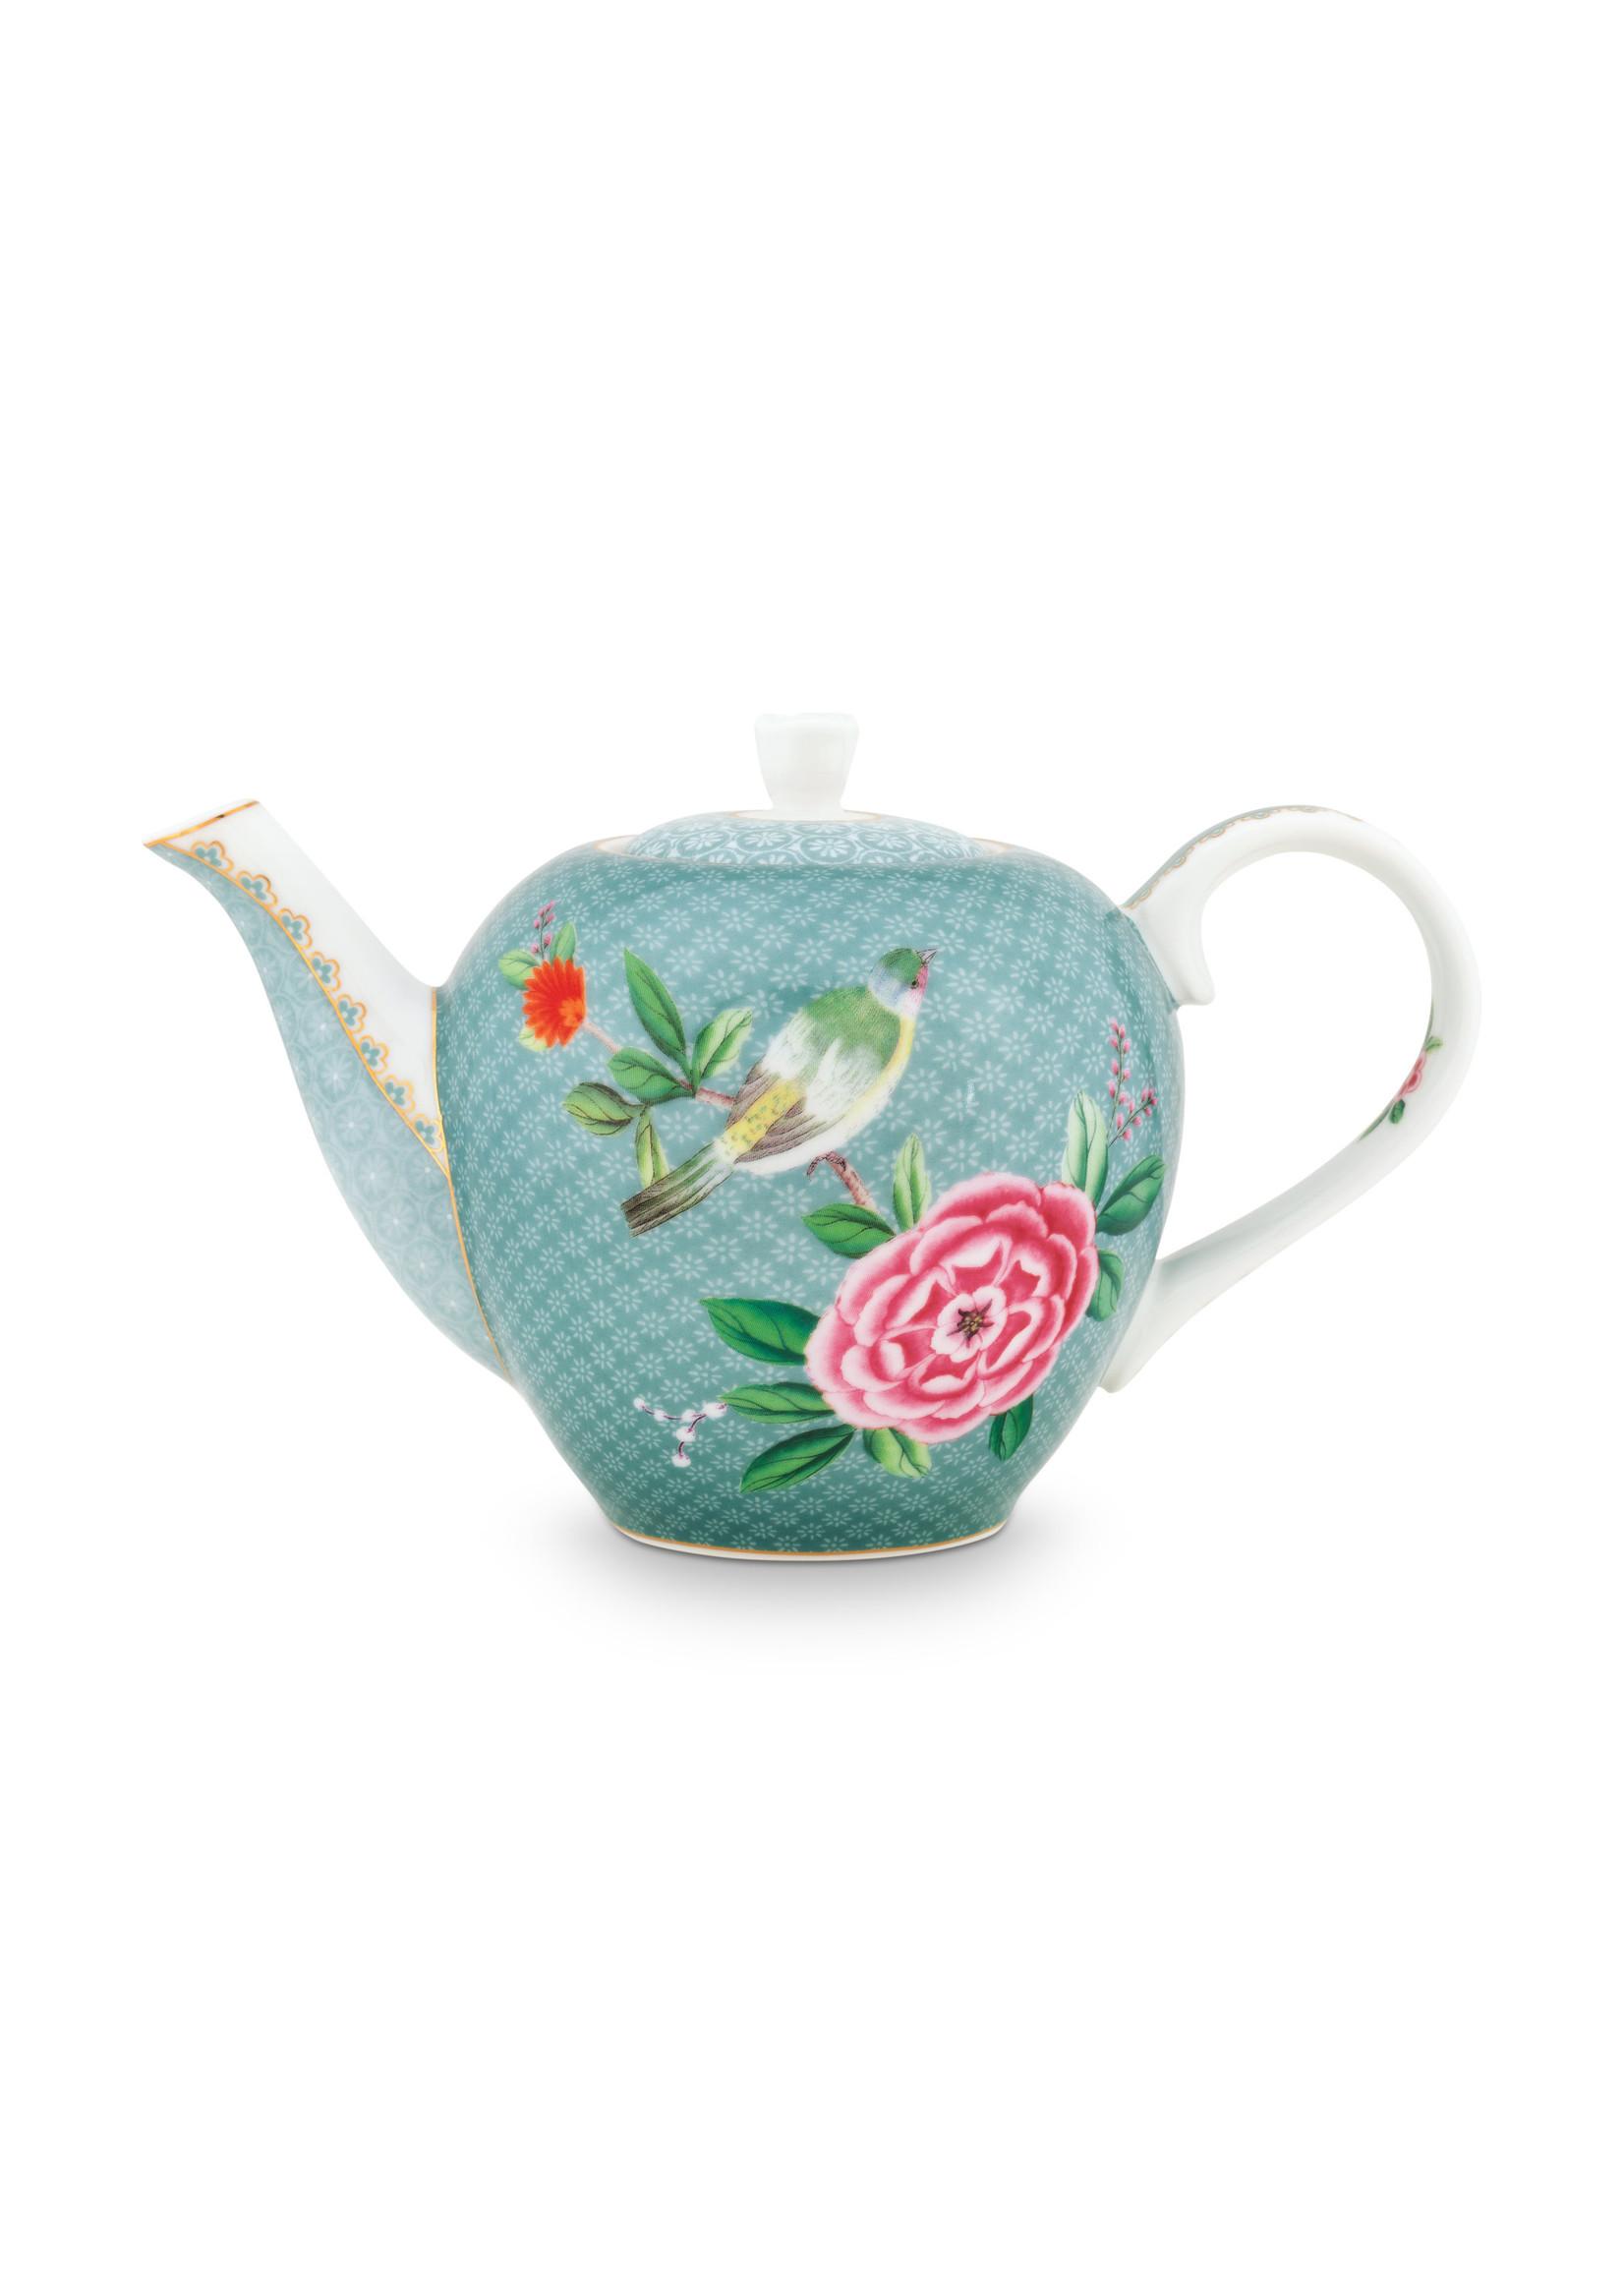 pip studio Tea Pot Small Blushing Birds Blue 750ml